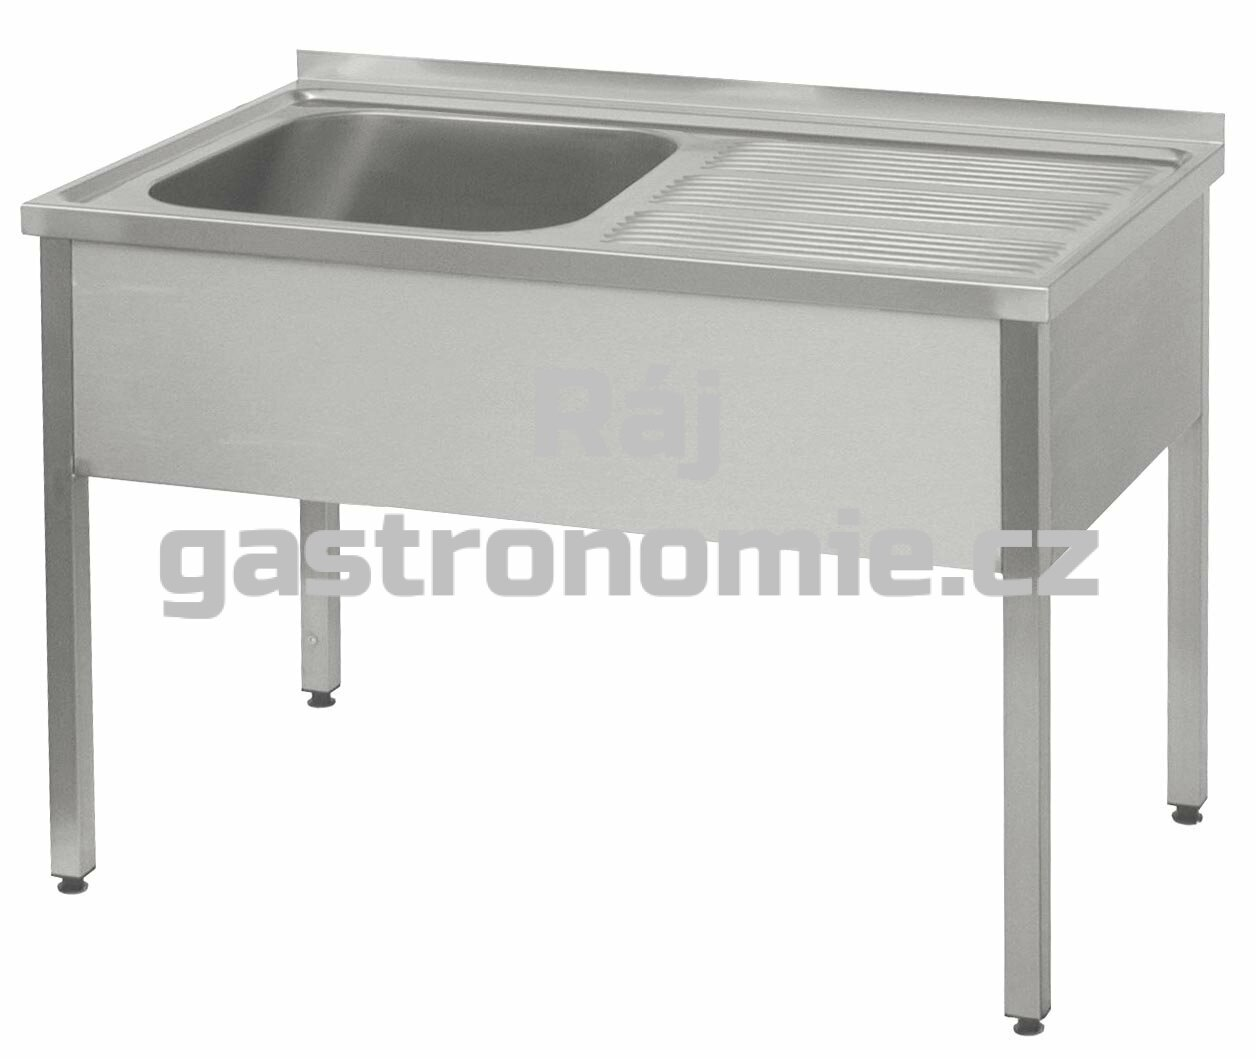 Dřez - 140x60, nádoba 50x50x30 cm